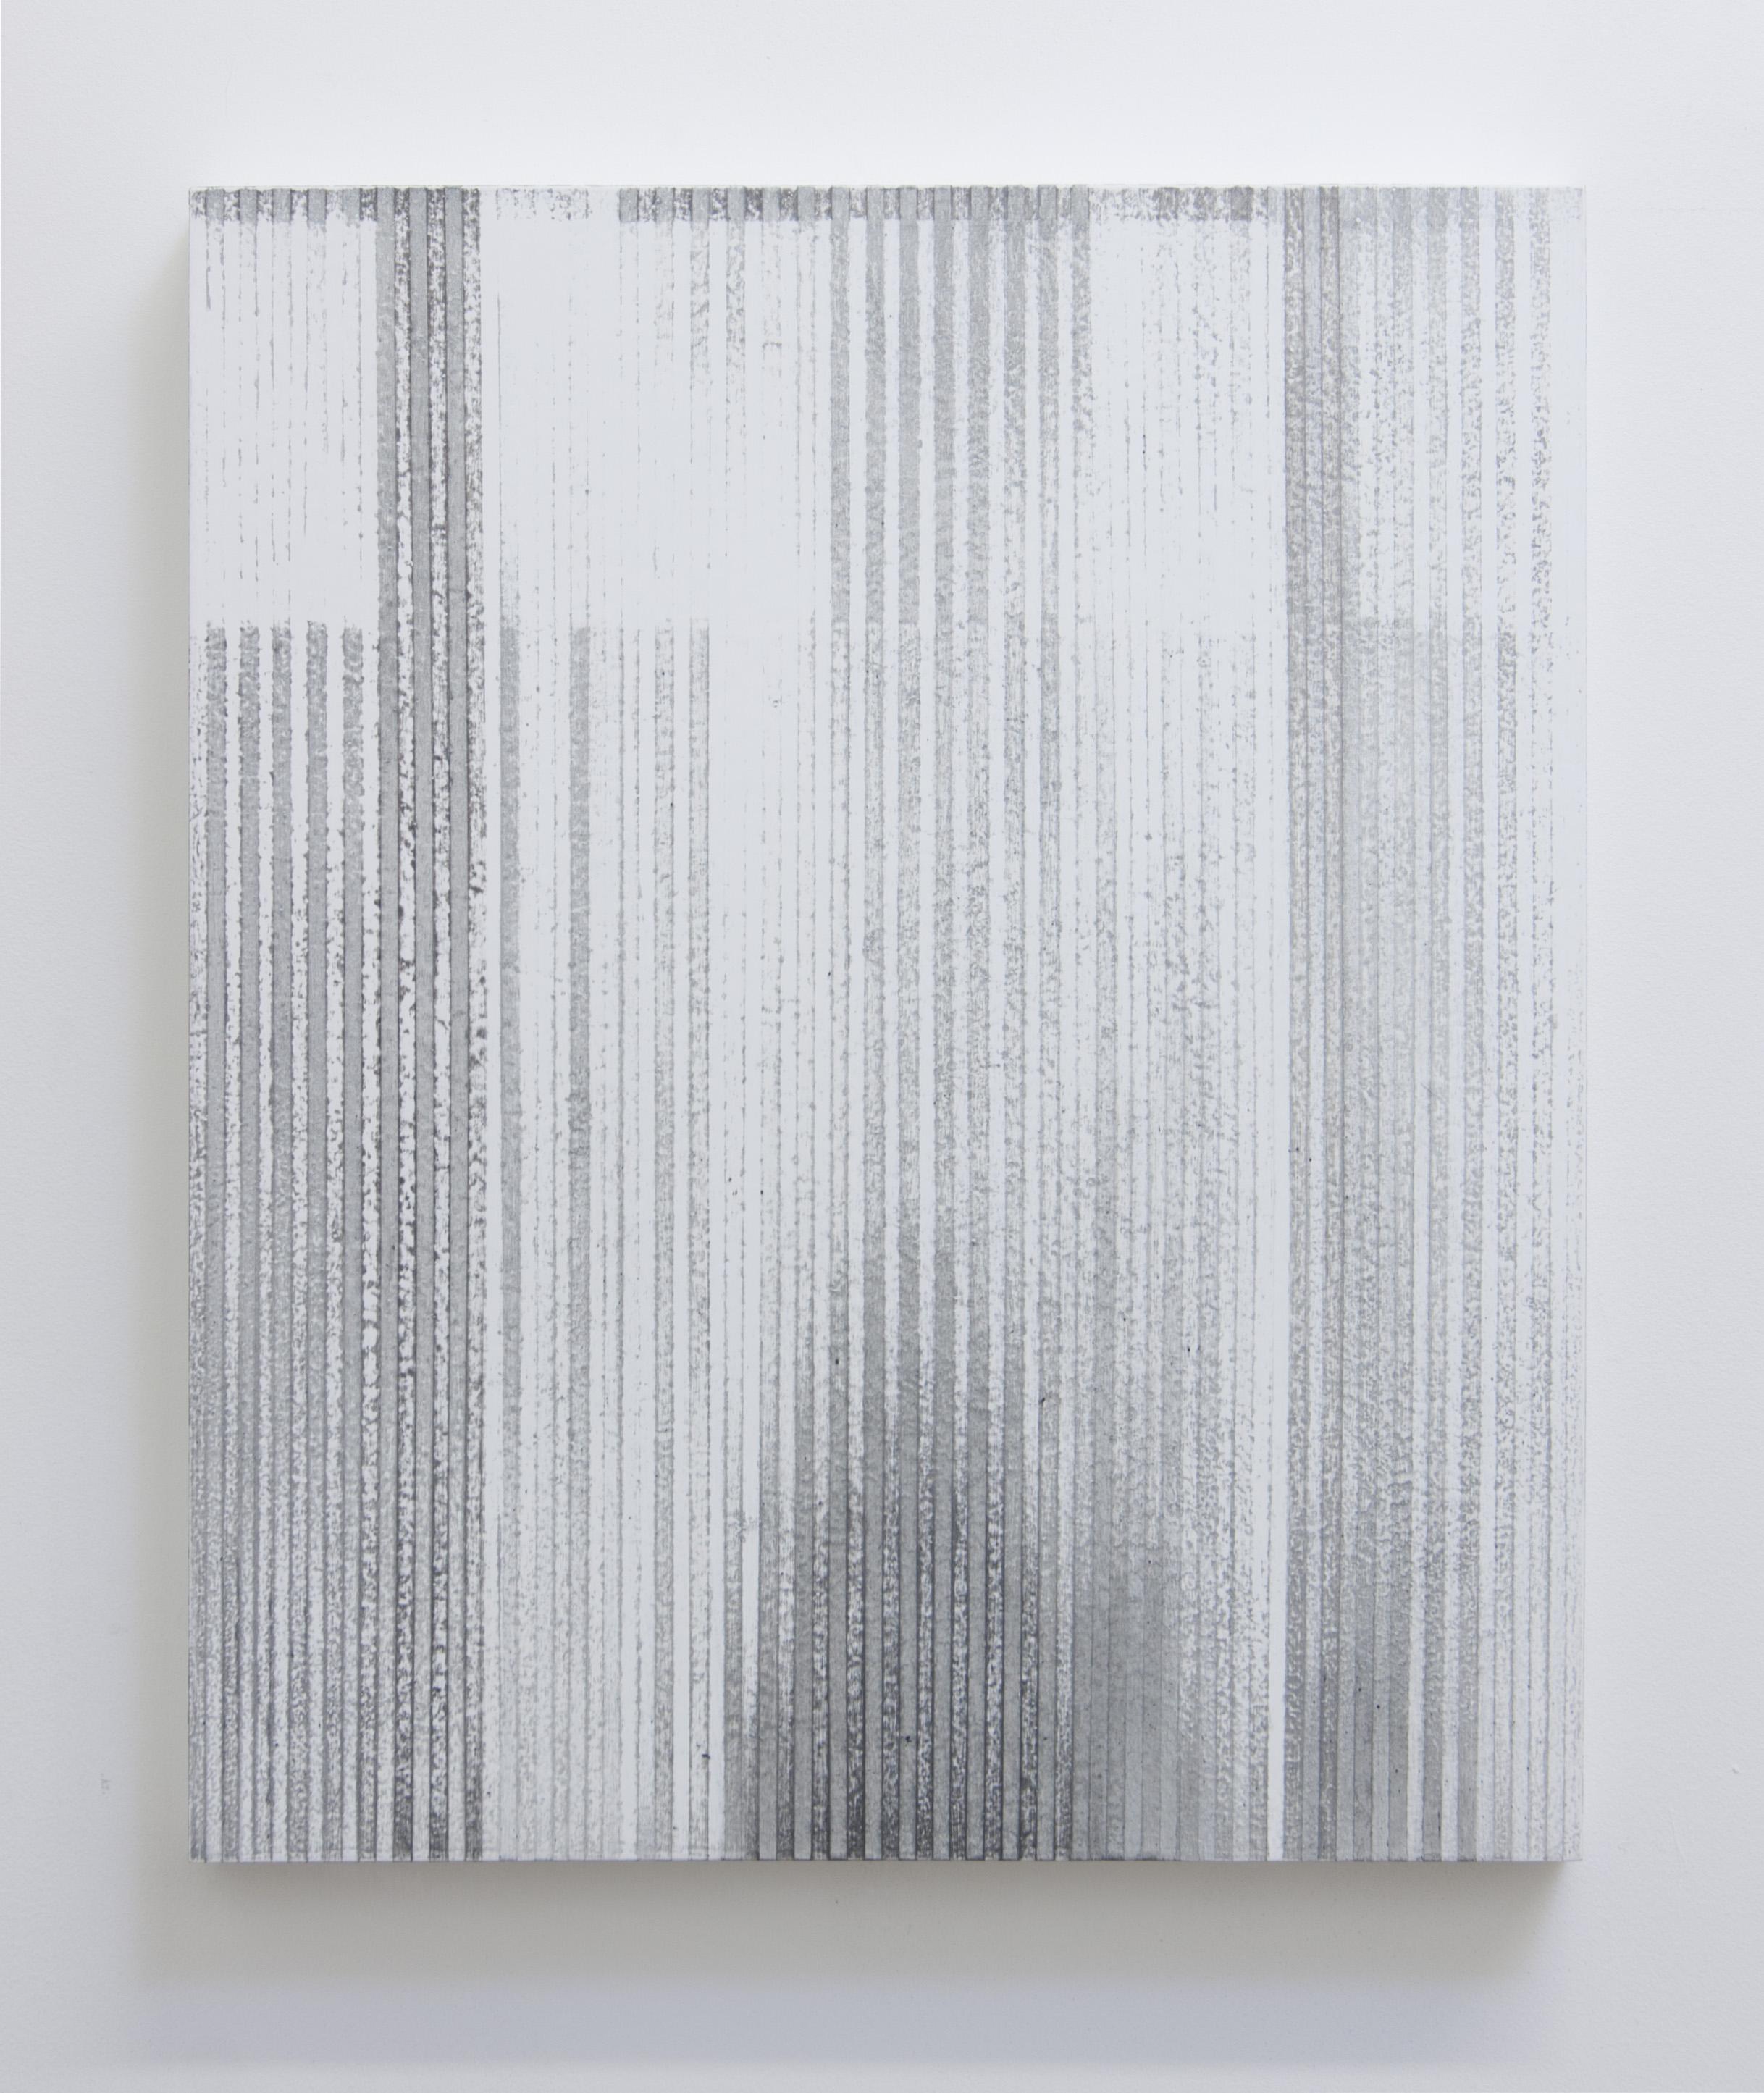 Bloodless Language II, 2014  Acrylic on panel, 24 x 20 inches